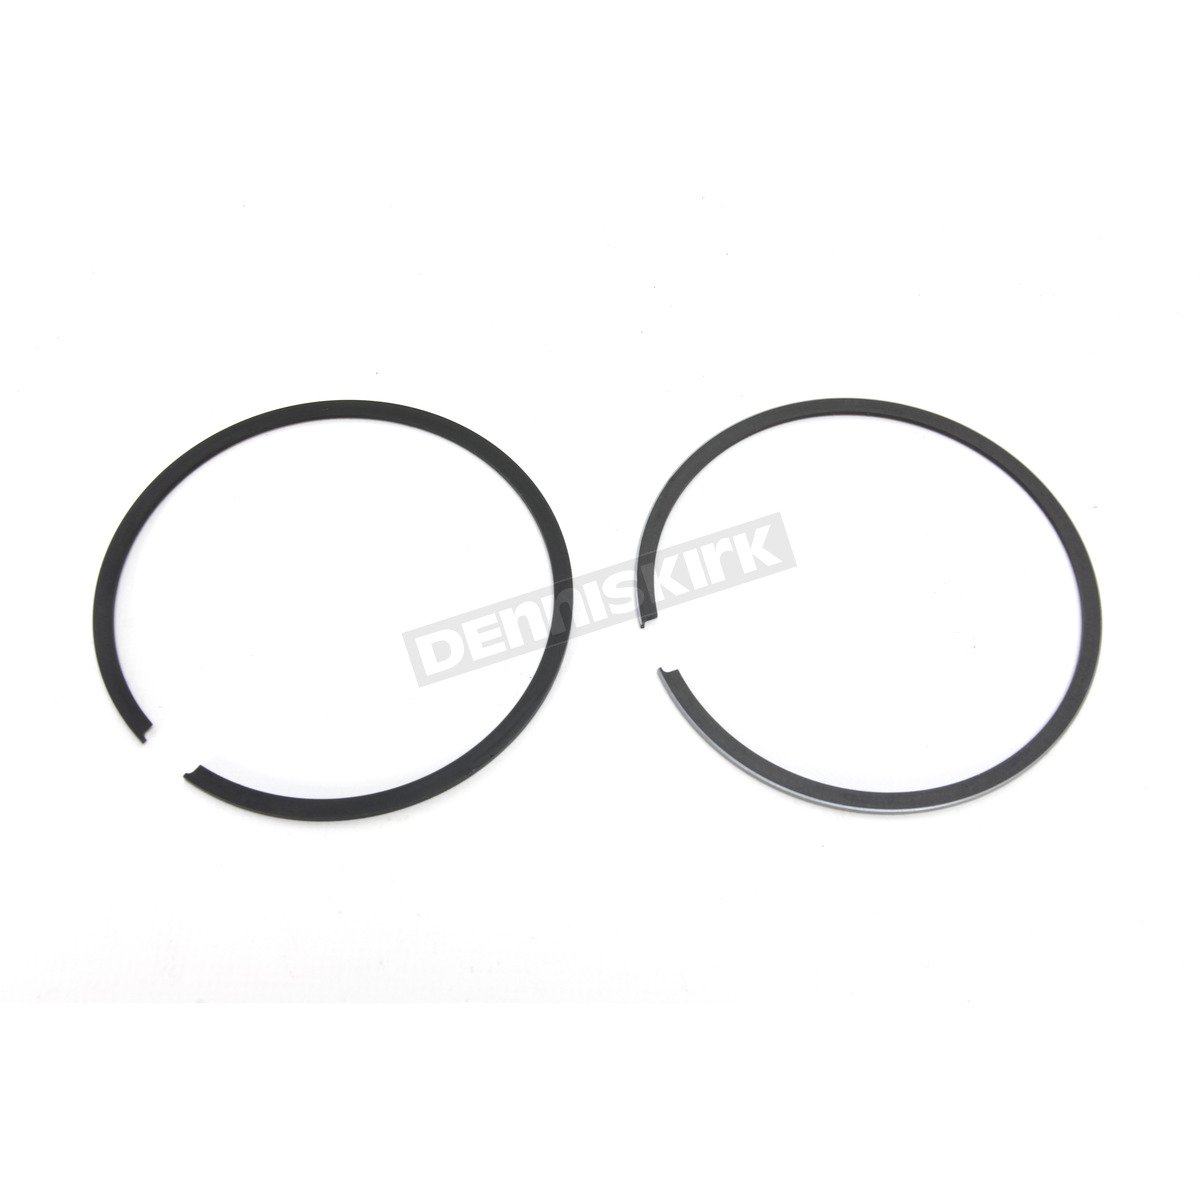 Parts Unlimited Piston Ring Set